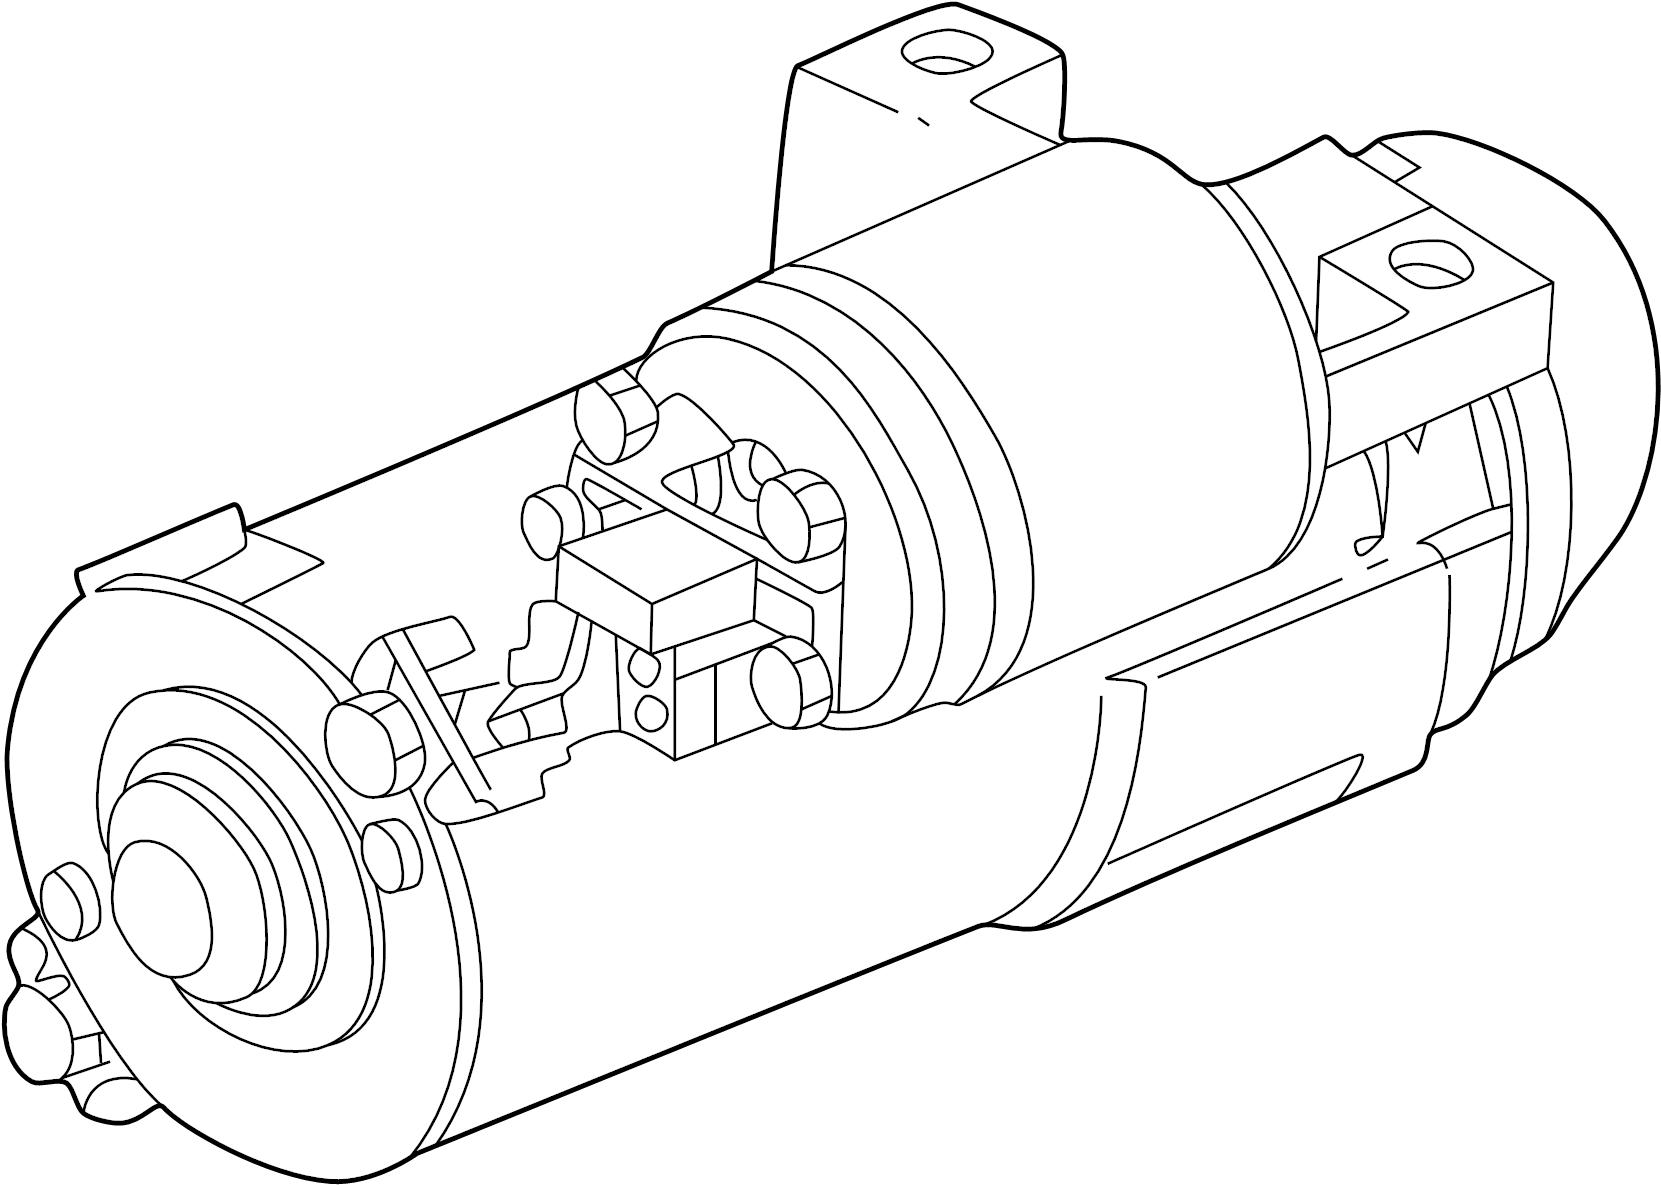 Service Manual Chrysler Town Country Diagram Showing Brake Line